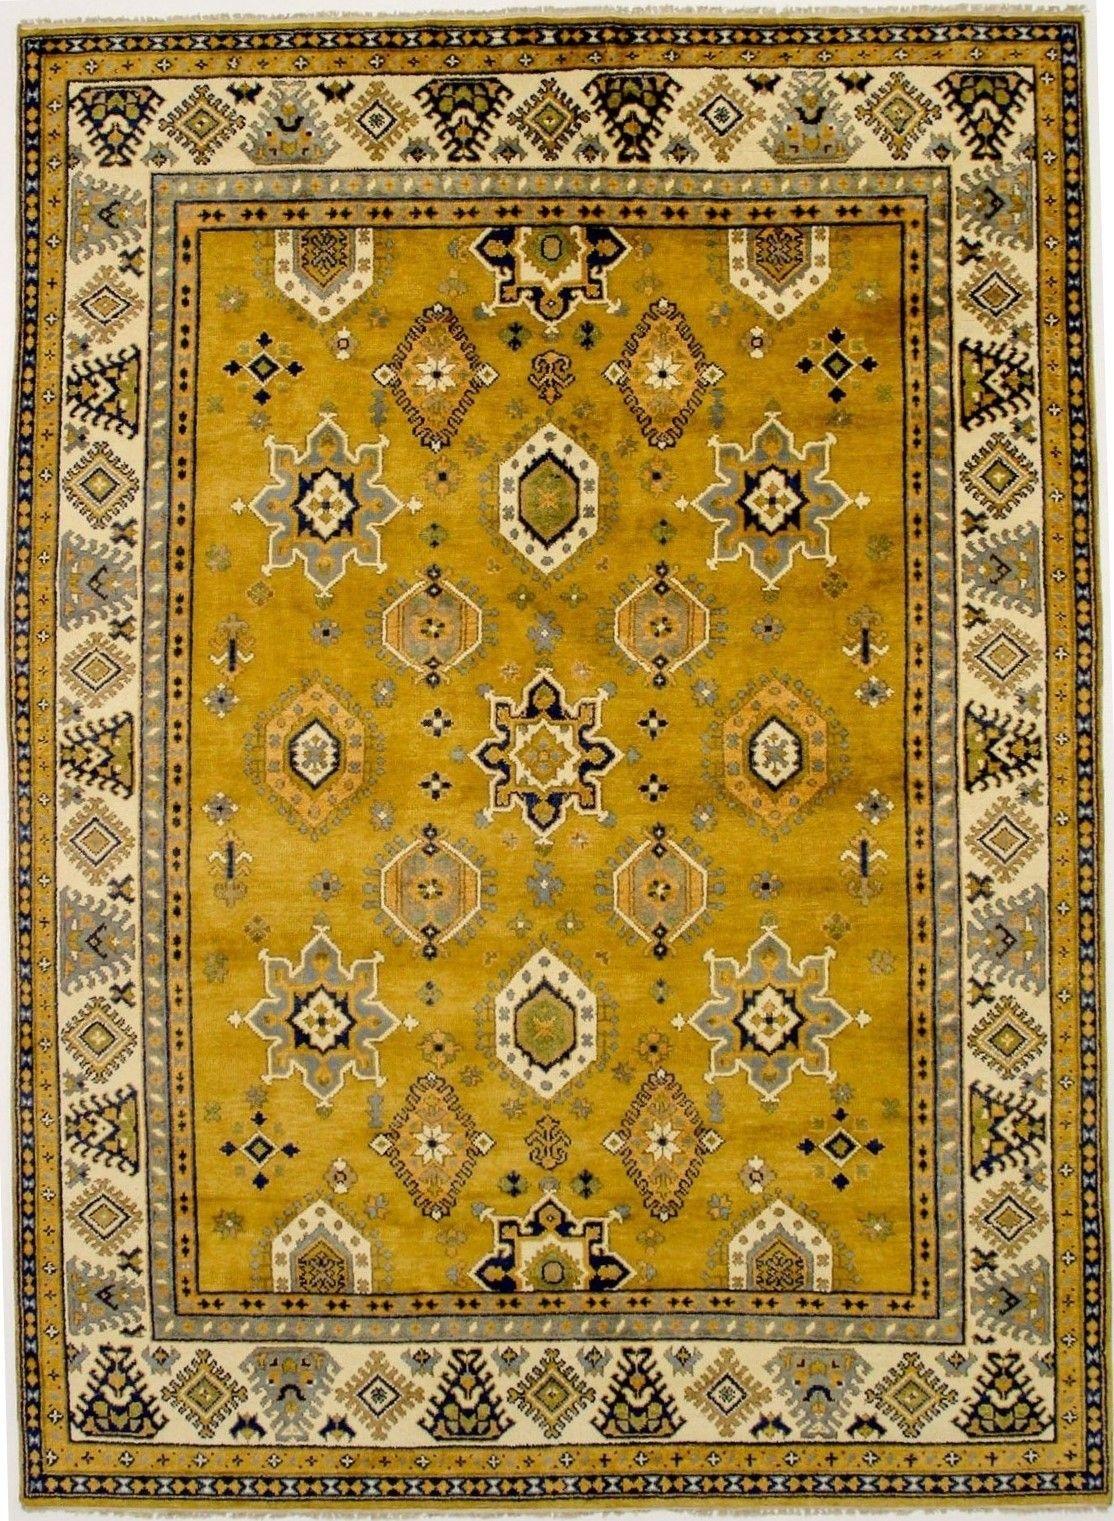 Antique Persian Rugs Astonishing Handmade Vintage Rare